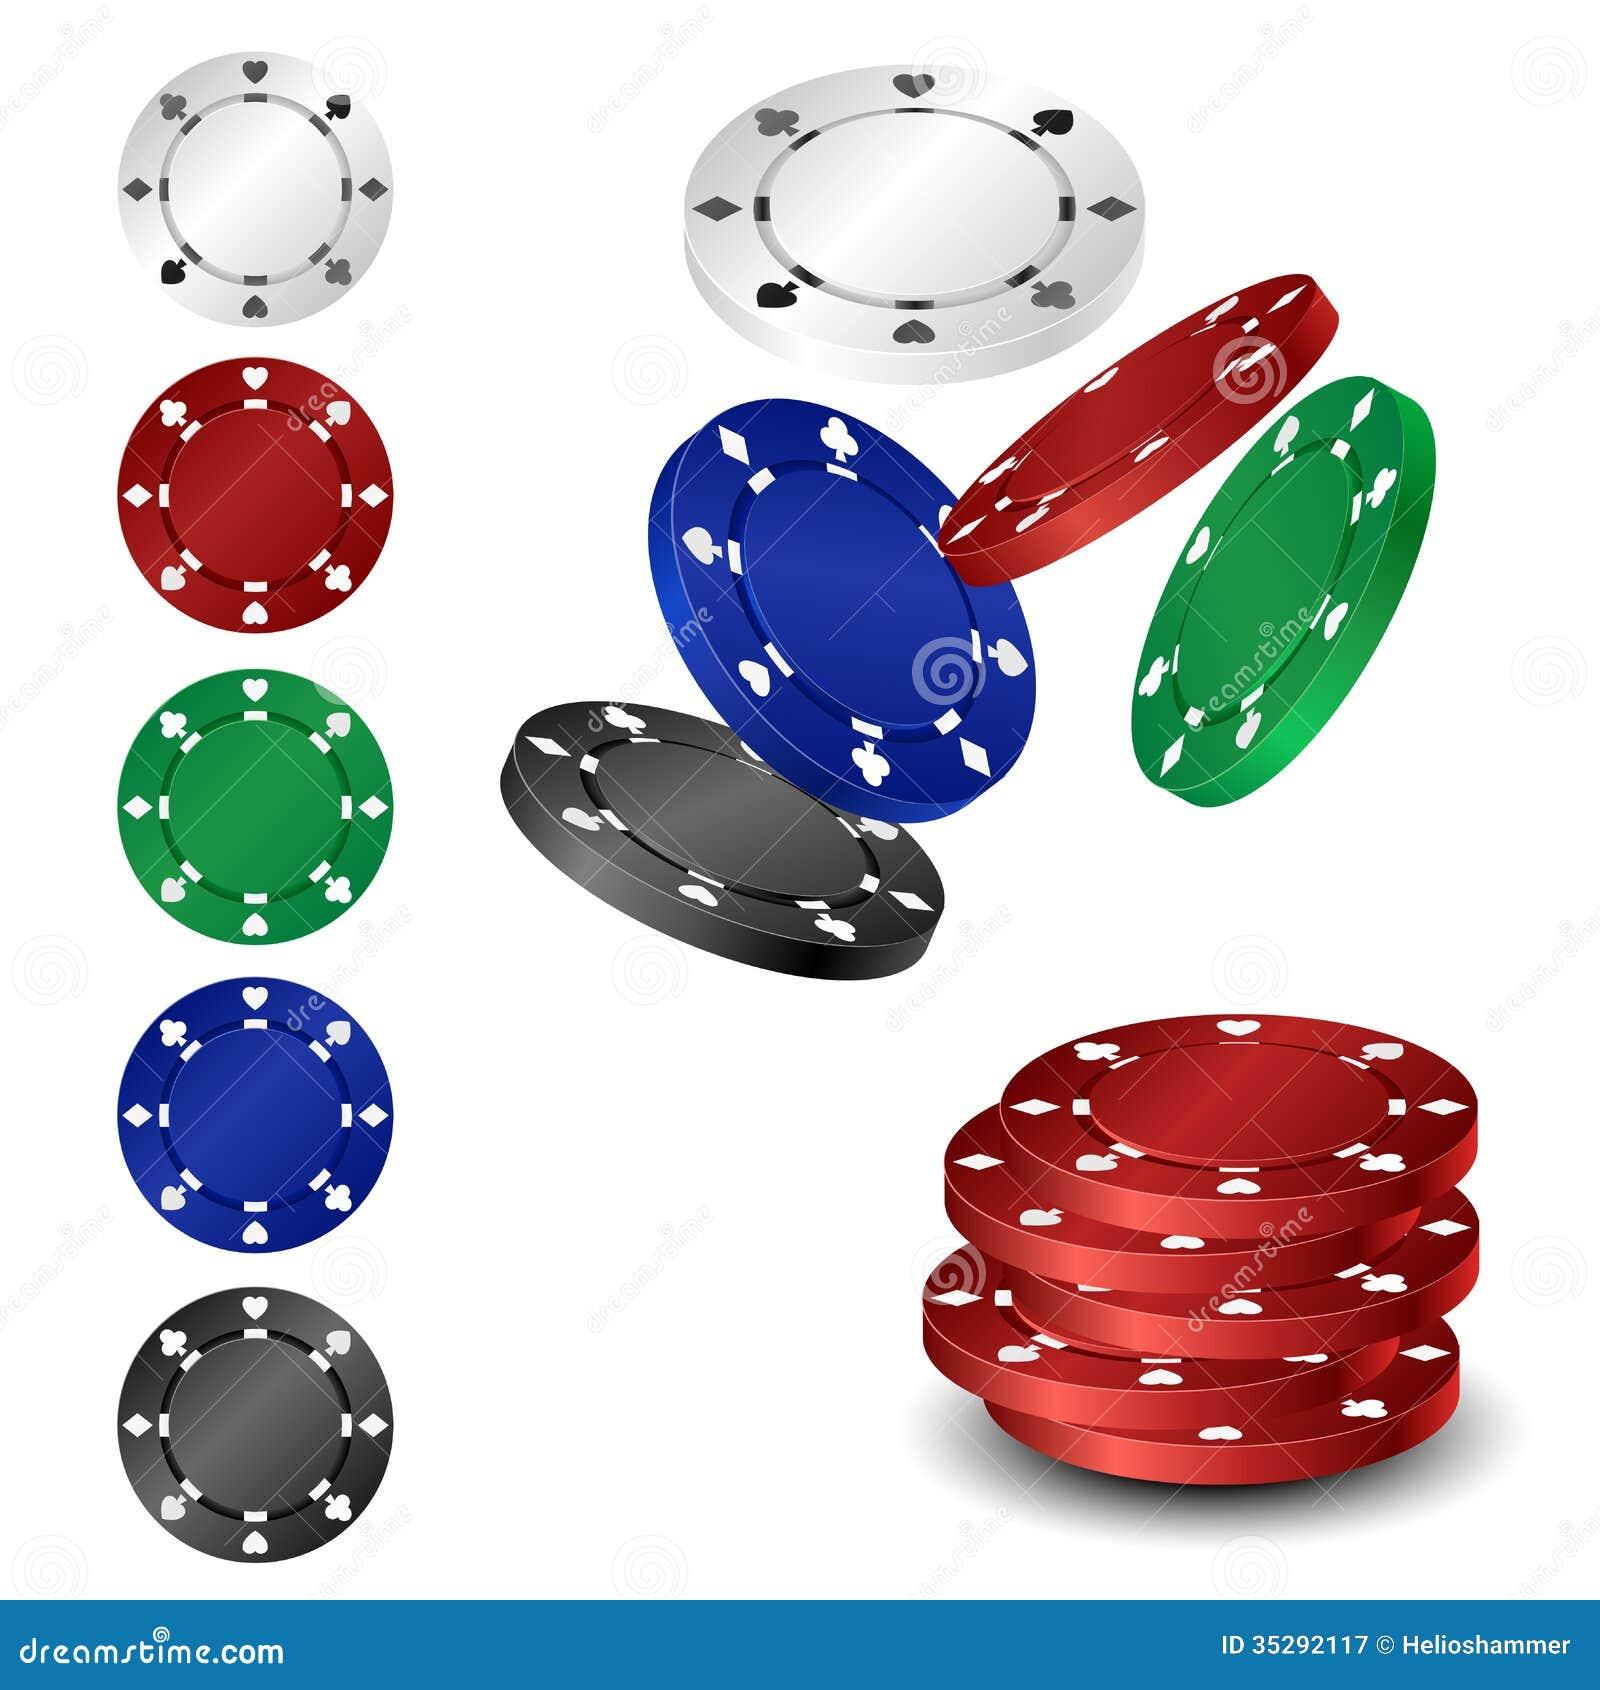 Game Room 2000  free games online  free pool games